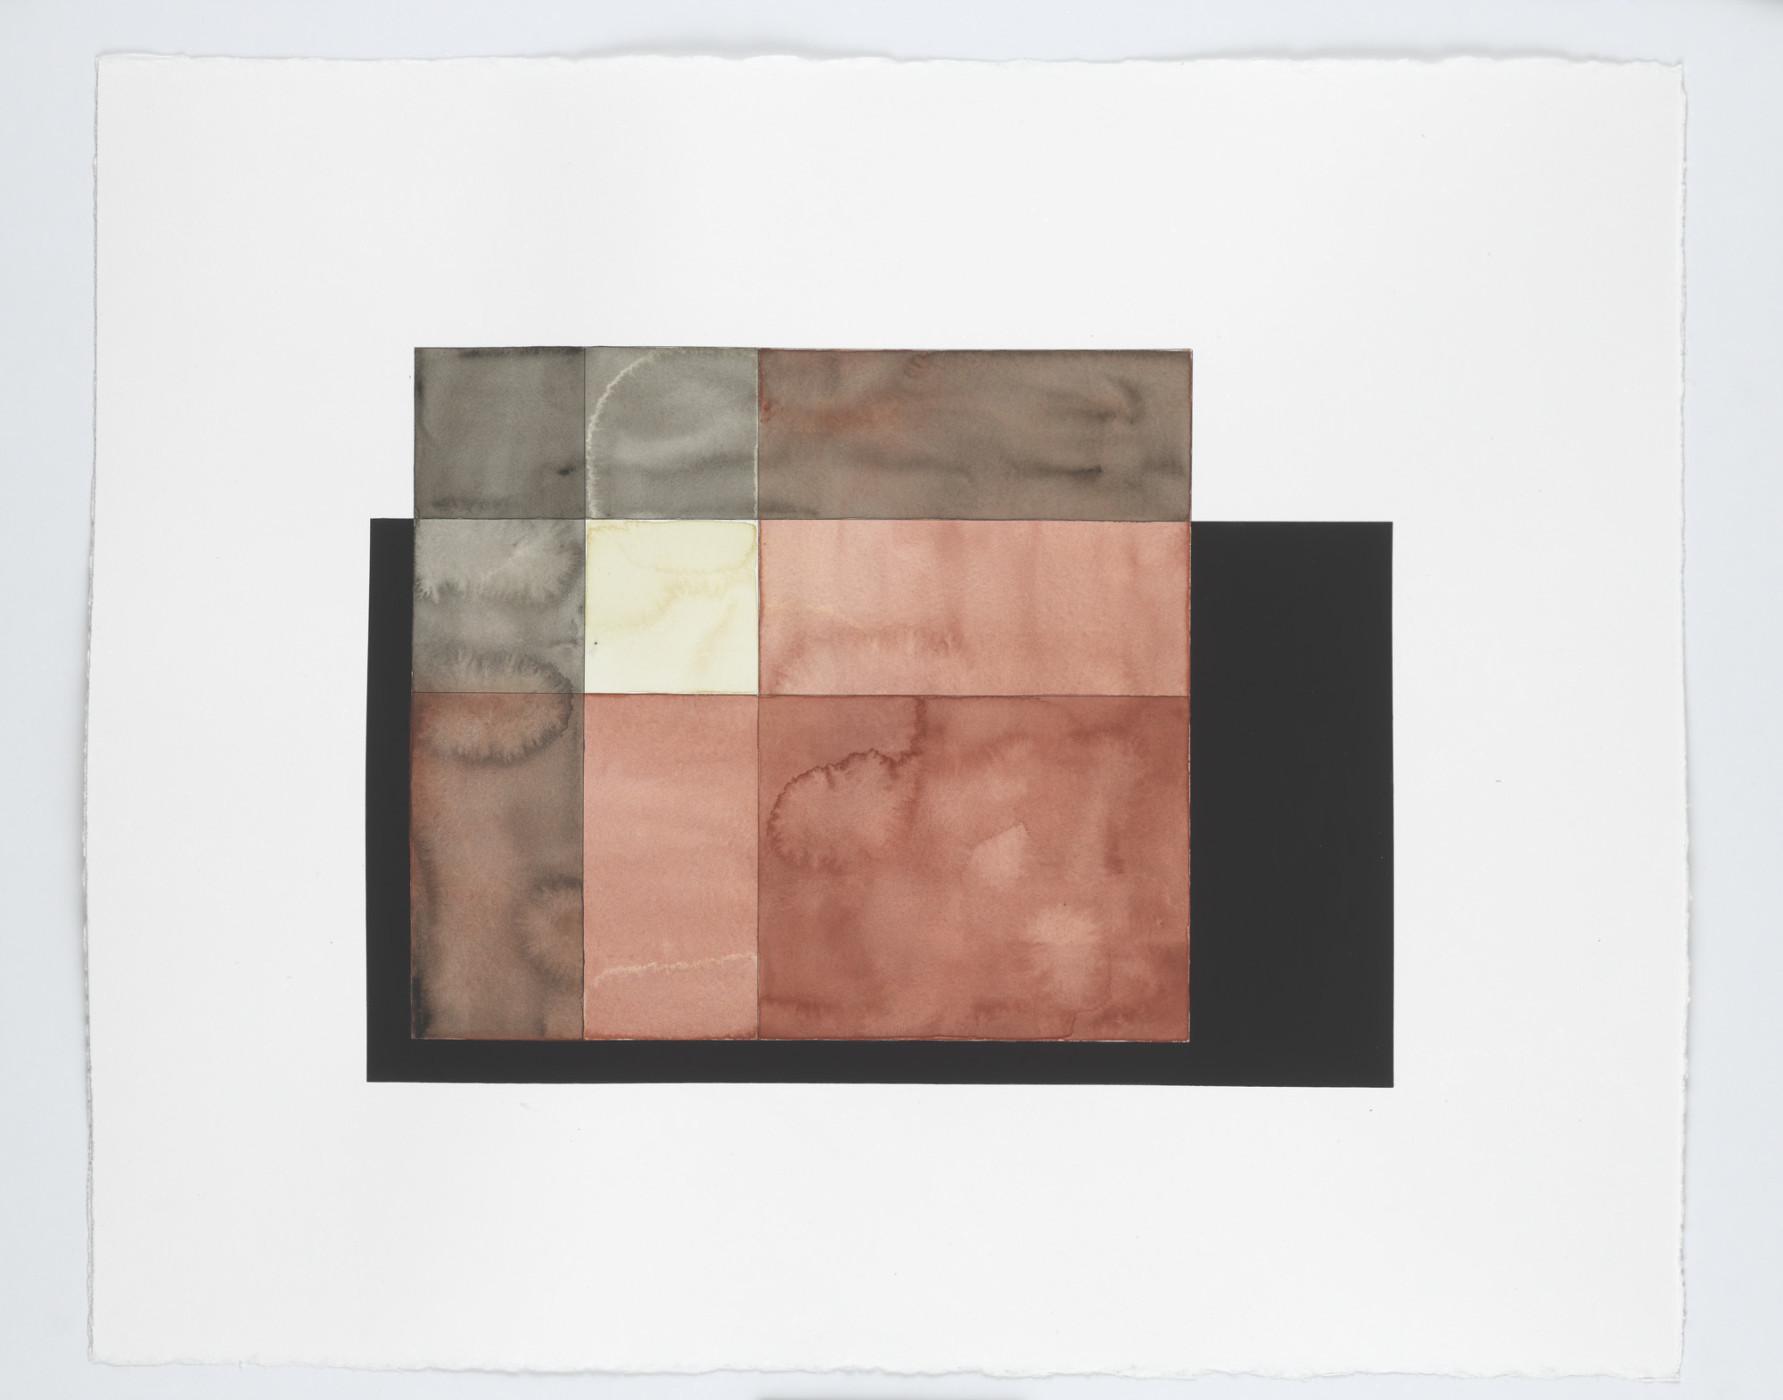 "<p><em>Warp and Weft Study (rust, white and black)</em>, 2013</p><div class=""medium"">watercolour and gouache on paper</div><div class=""dimensions"">63.6 x 75.9 x 3.4 cm</div><div class=""dimensions"">25 ⅛ x 29 ⅞ x 1 ⅜ in.</div>"